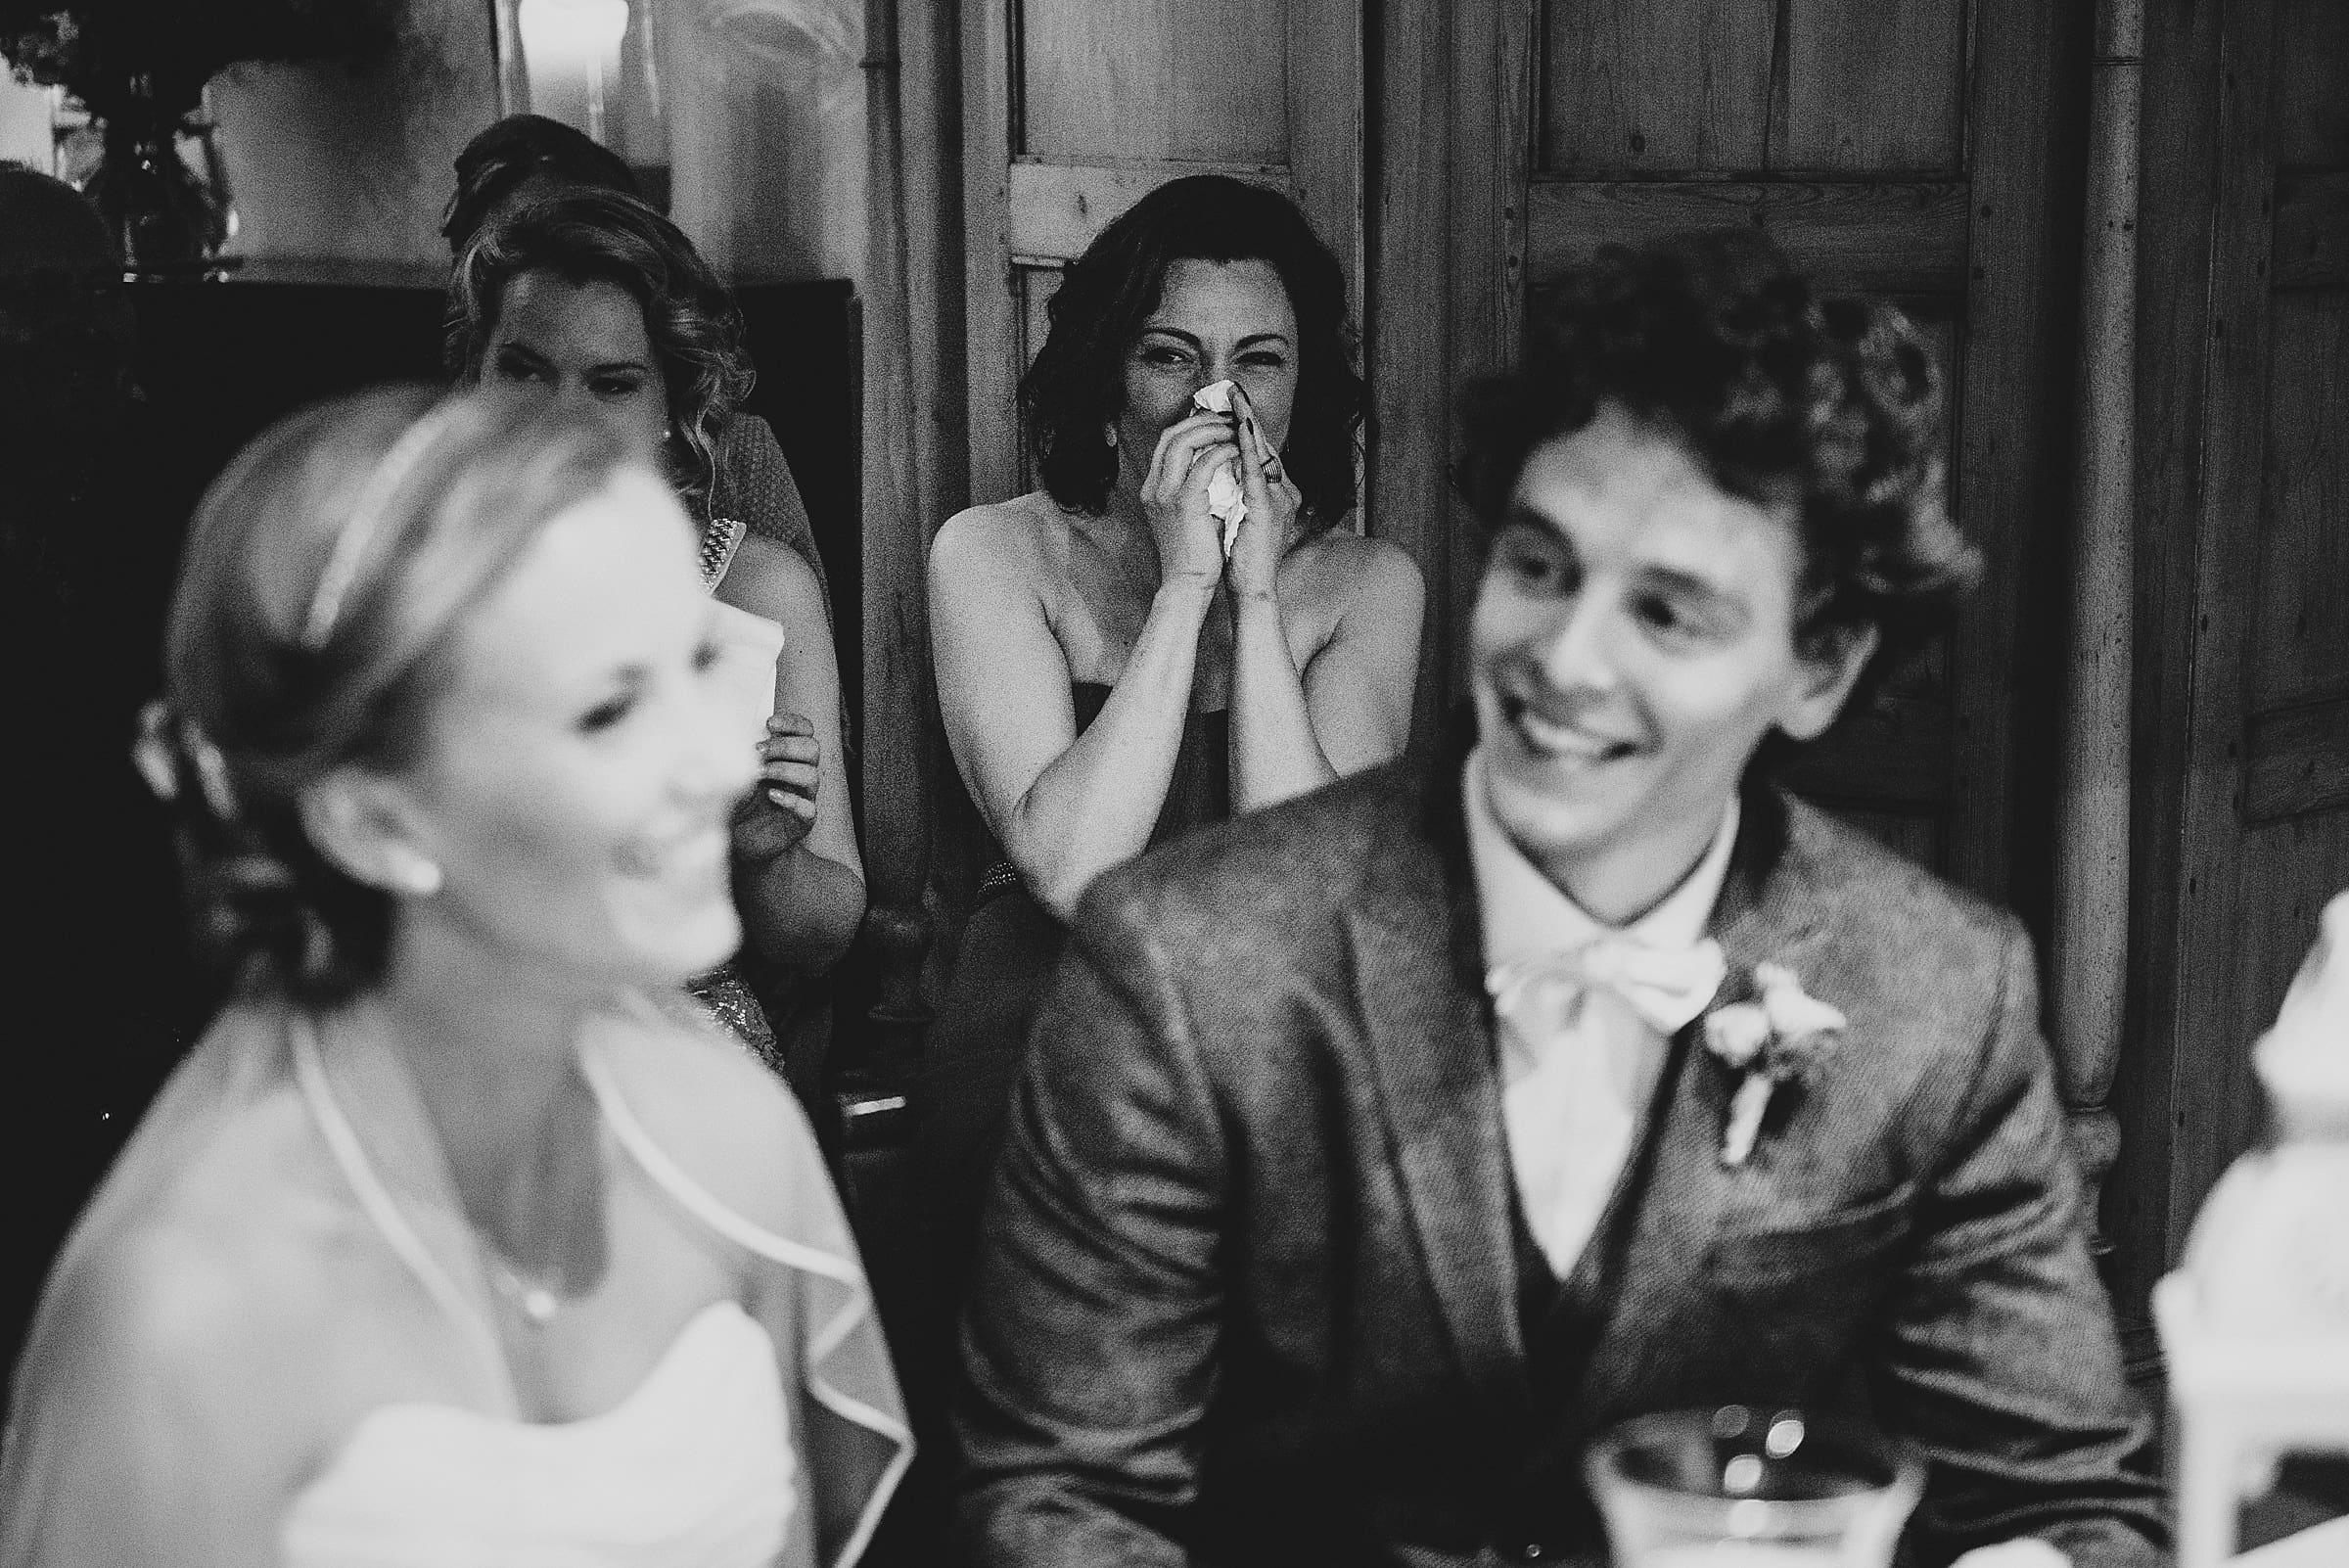 Hochzeitsfotografie-Frau-Siemers-Hof Weihe-freie Trauung-Trauzeugin weint